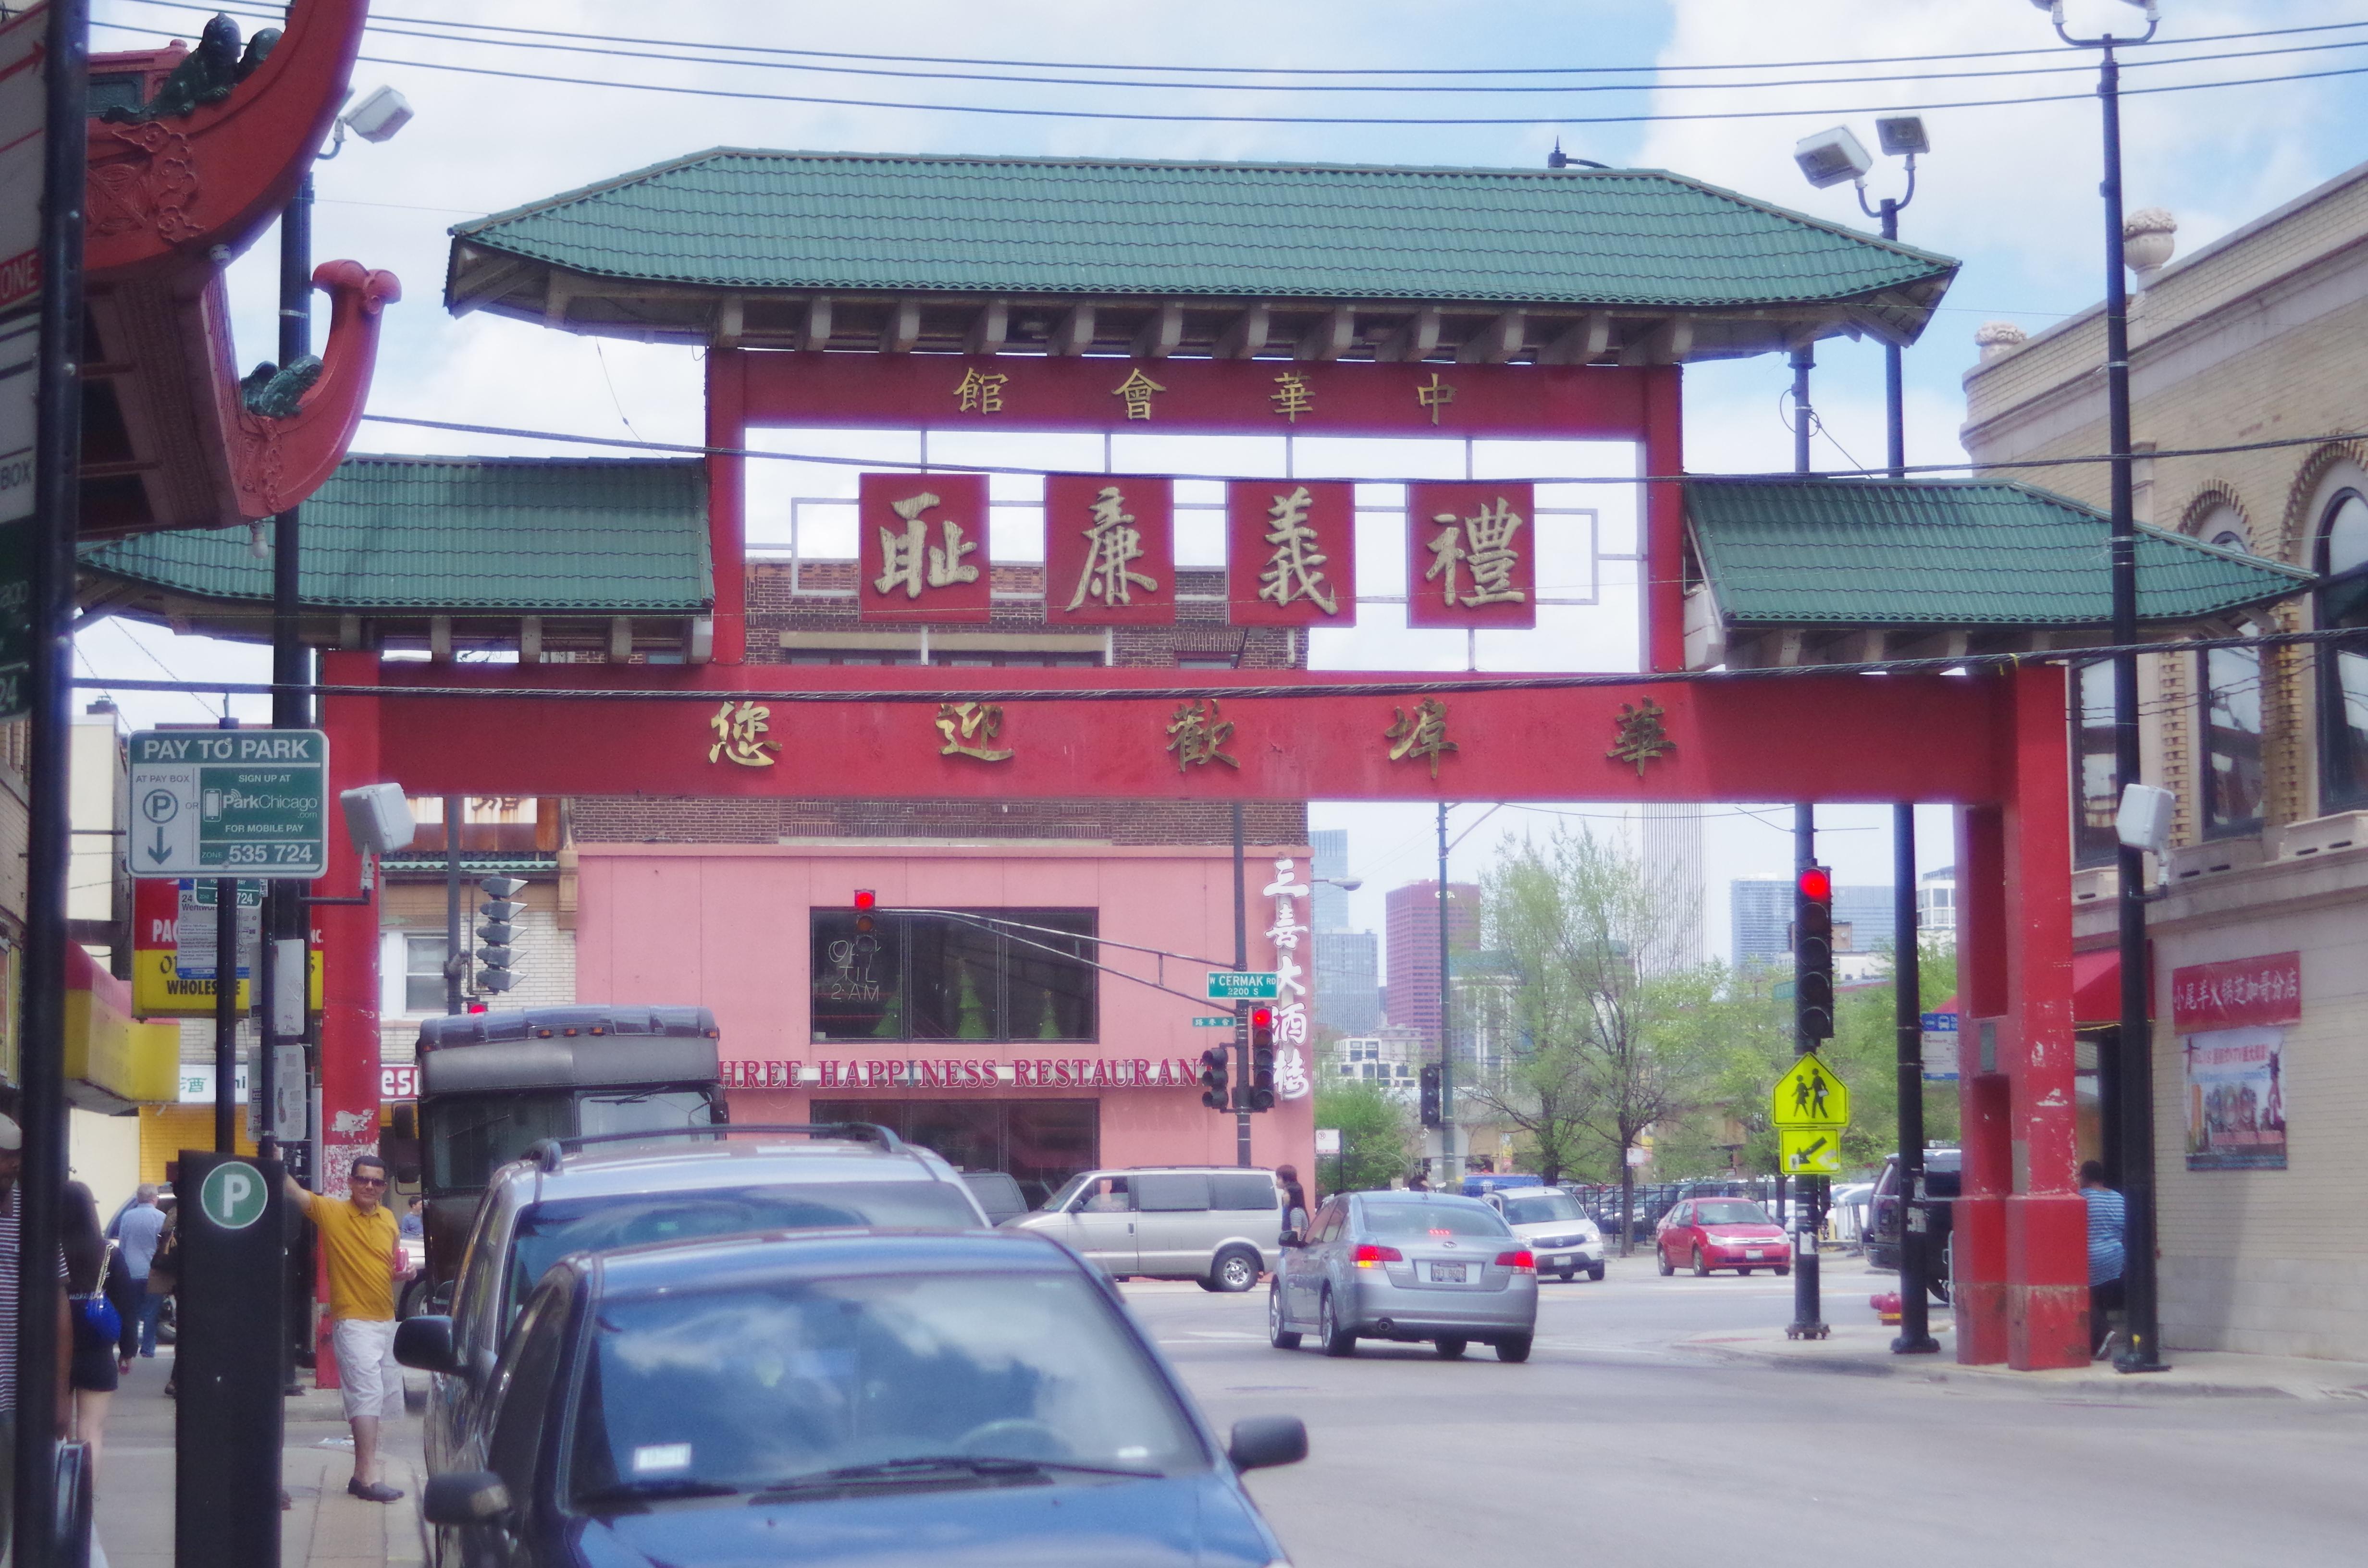 EXPLORING CHICAGO'S KOREAN SIDE: The K-Pop Store of